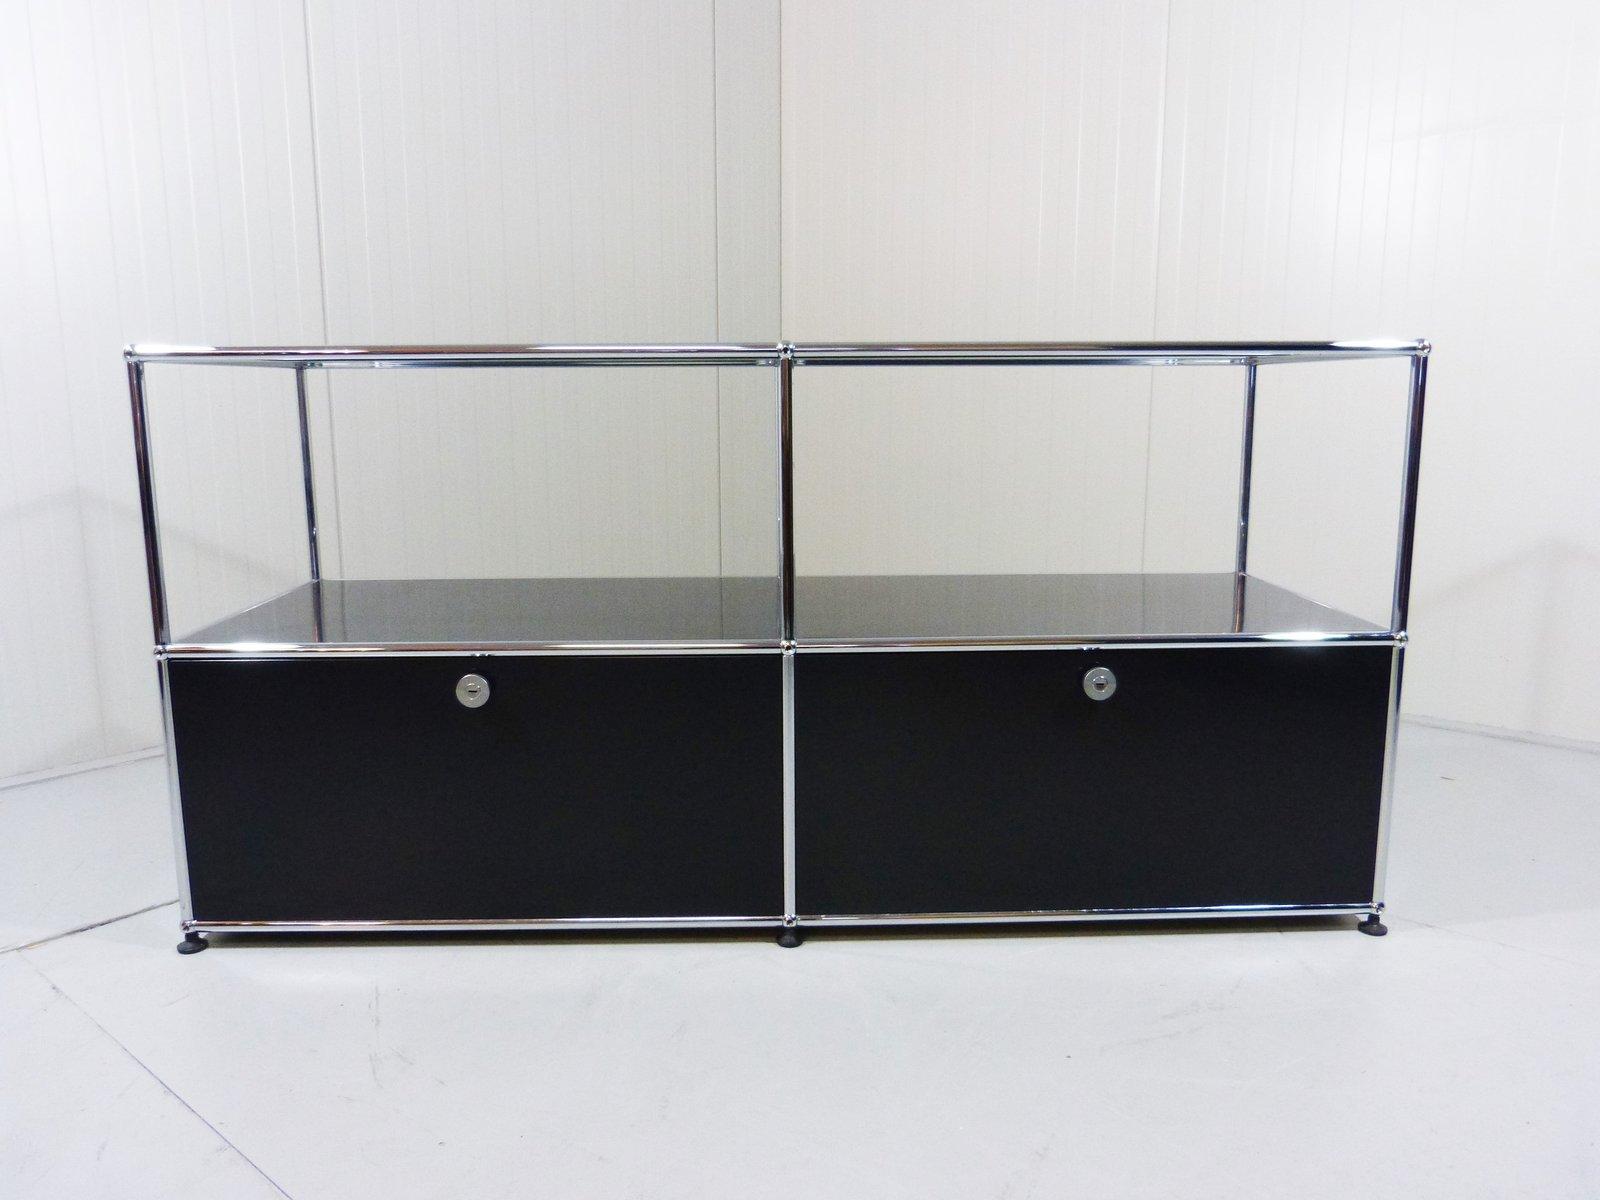 Modular sideboard system by fritz haller for usm haller for Sideboard usm